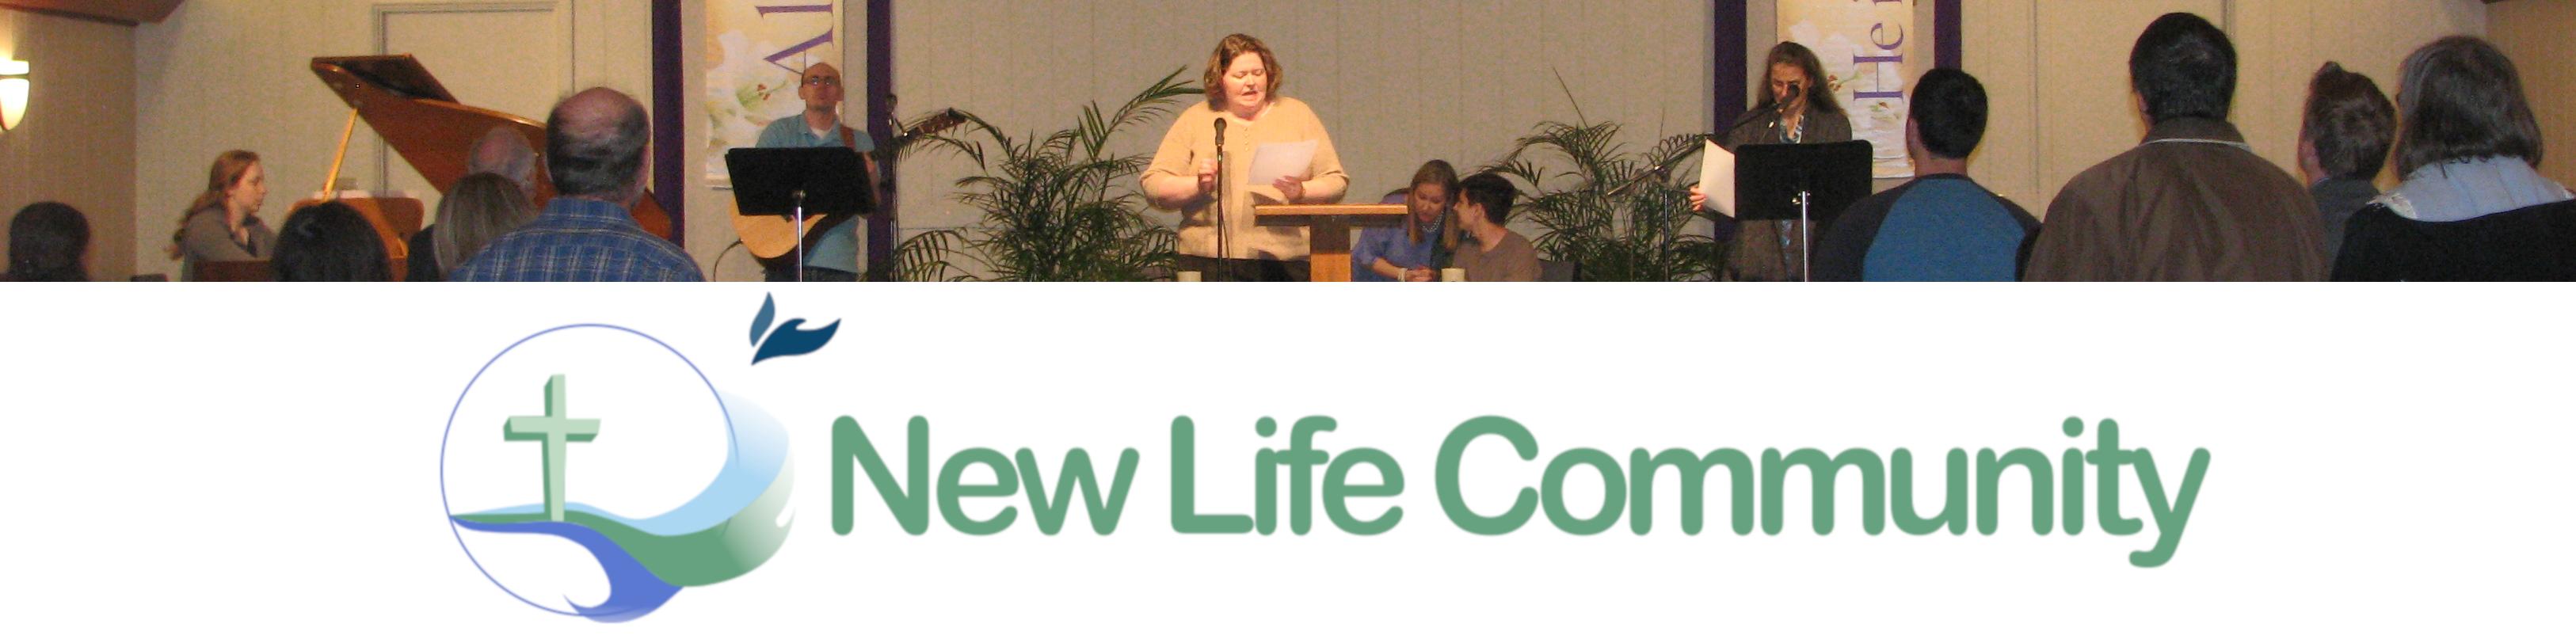 New Life Community